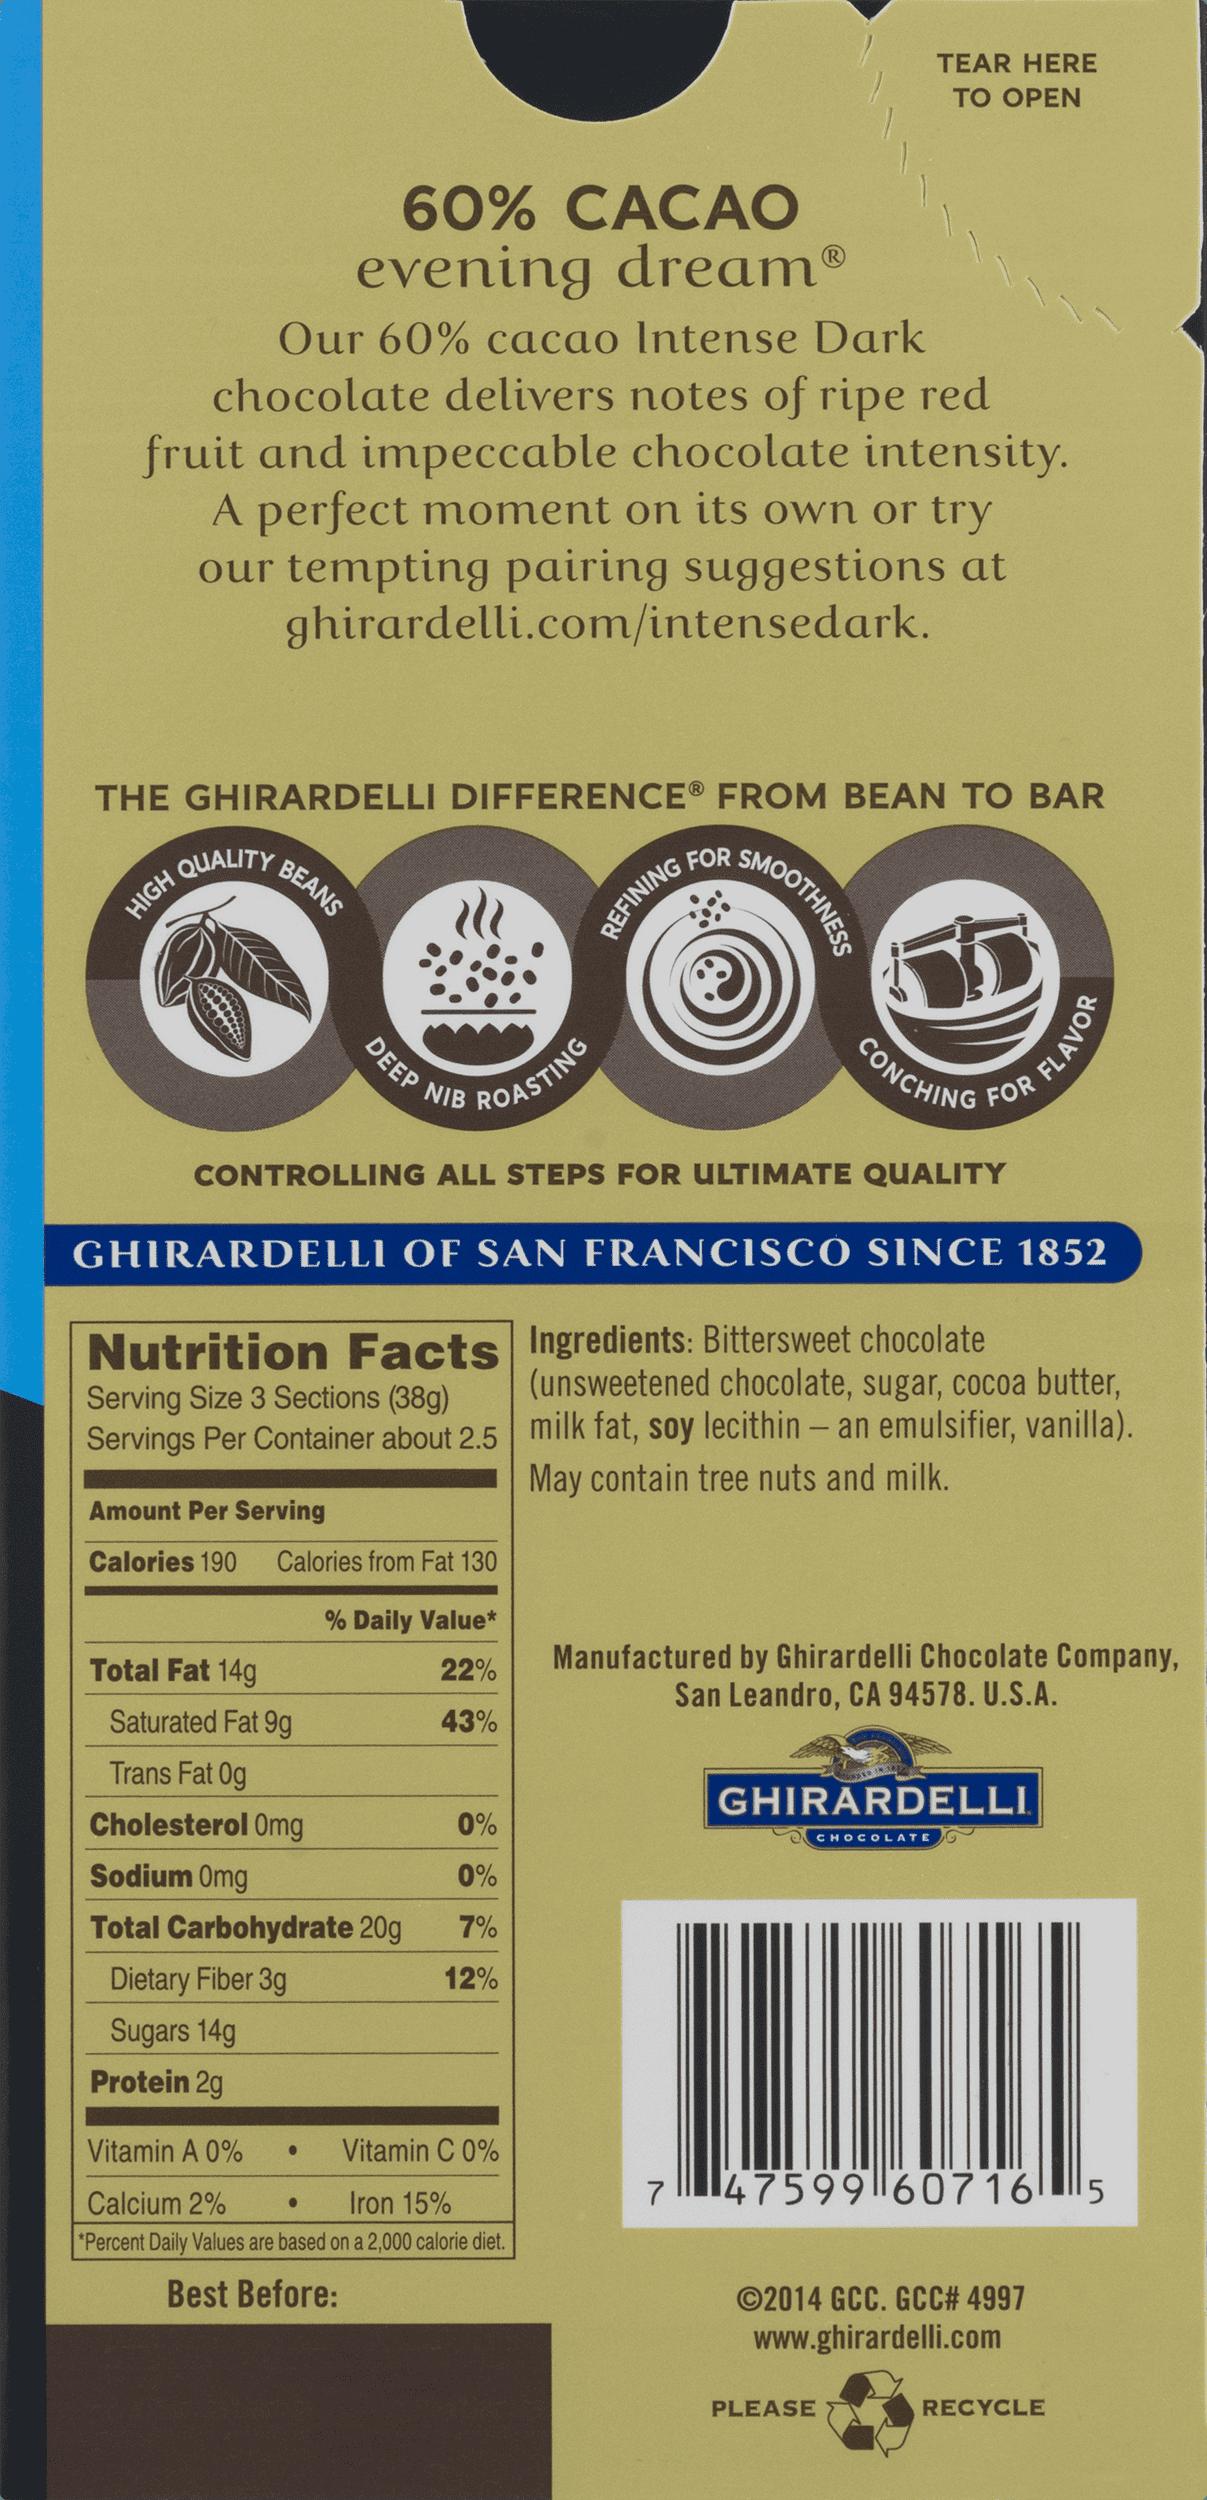 Ghirardelli Intense Dark Chocolate 60% Cacao Evening Dream, 3.5 OZ ...